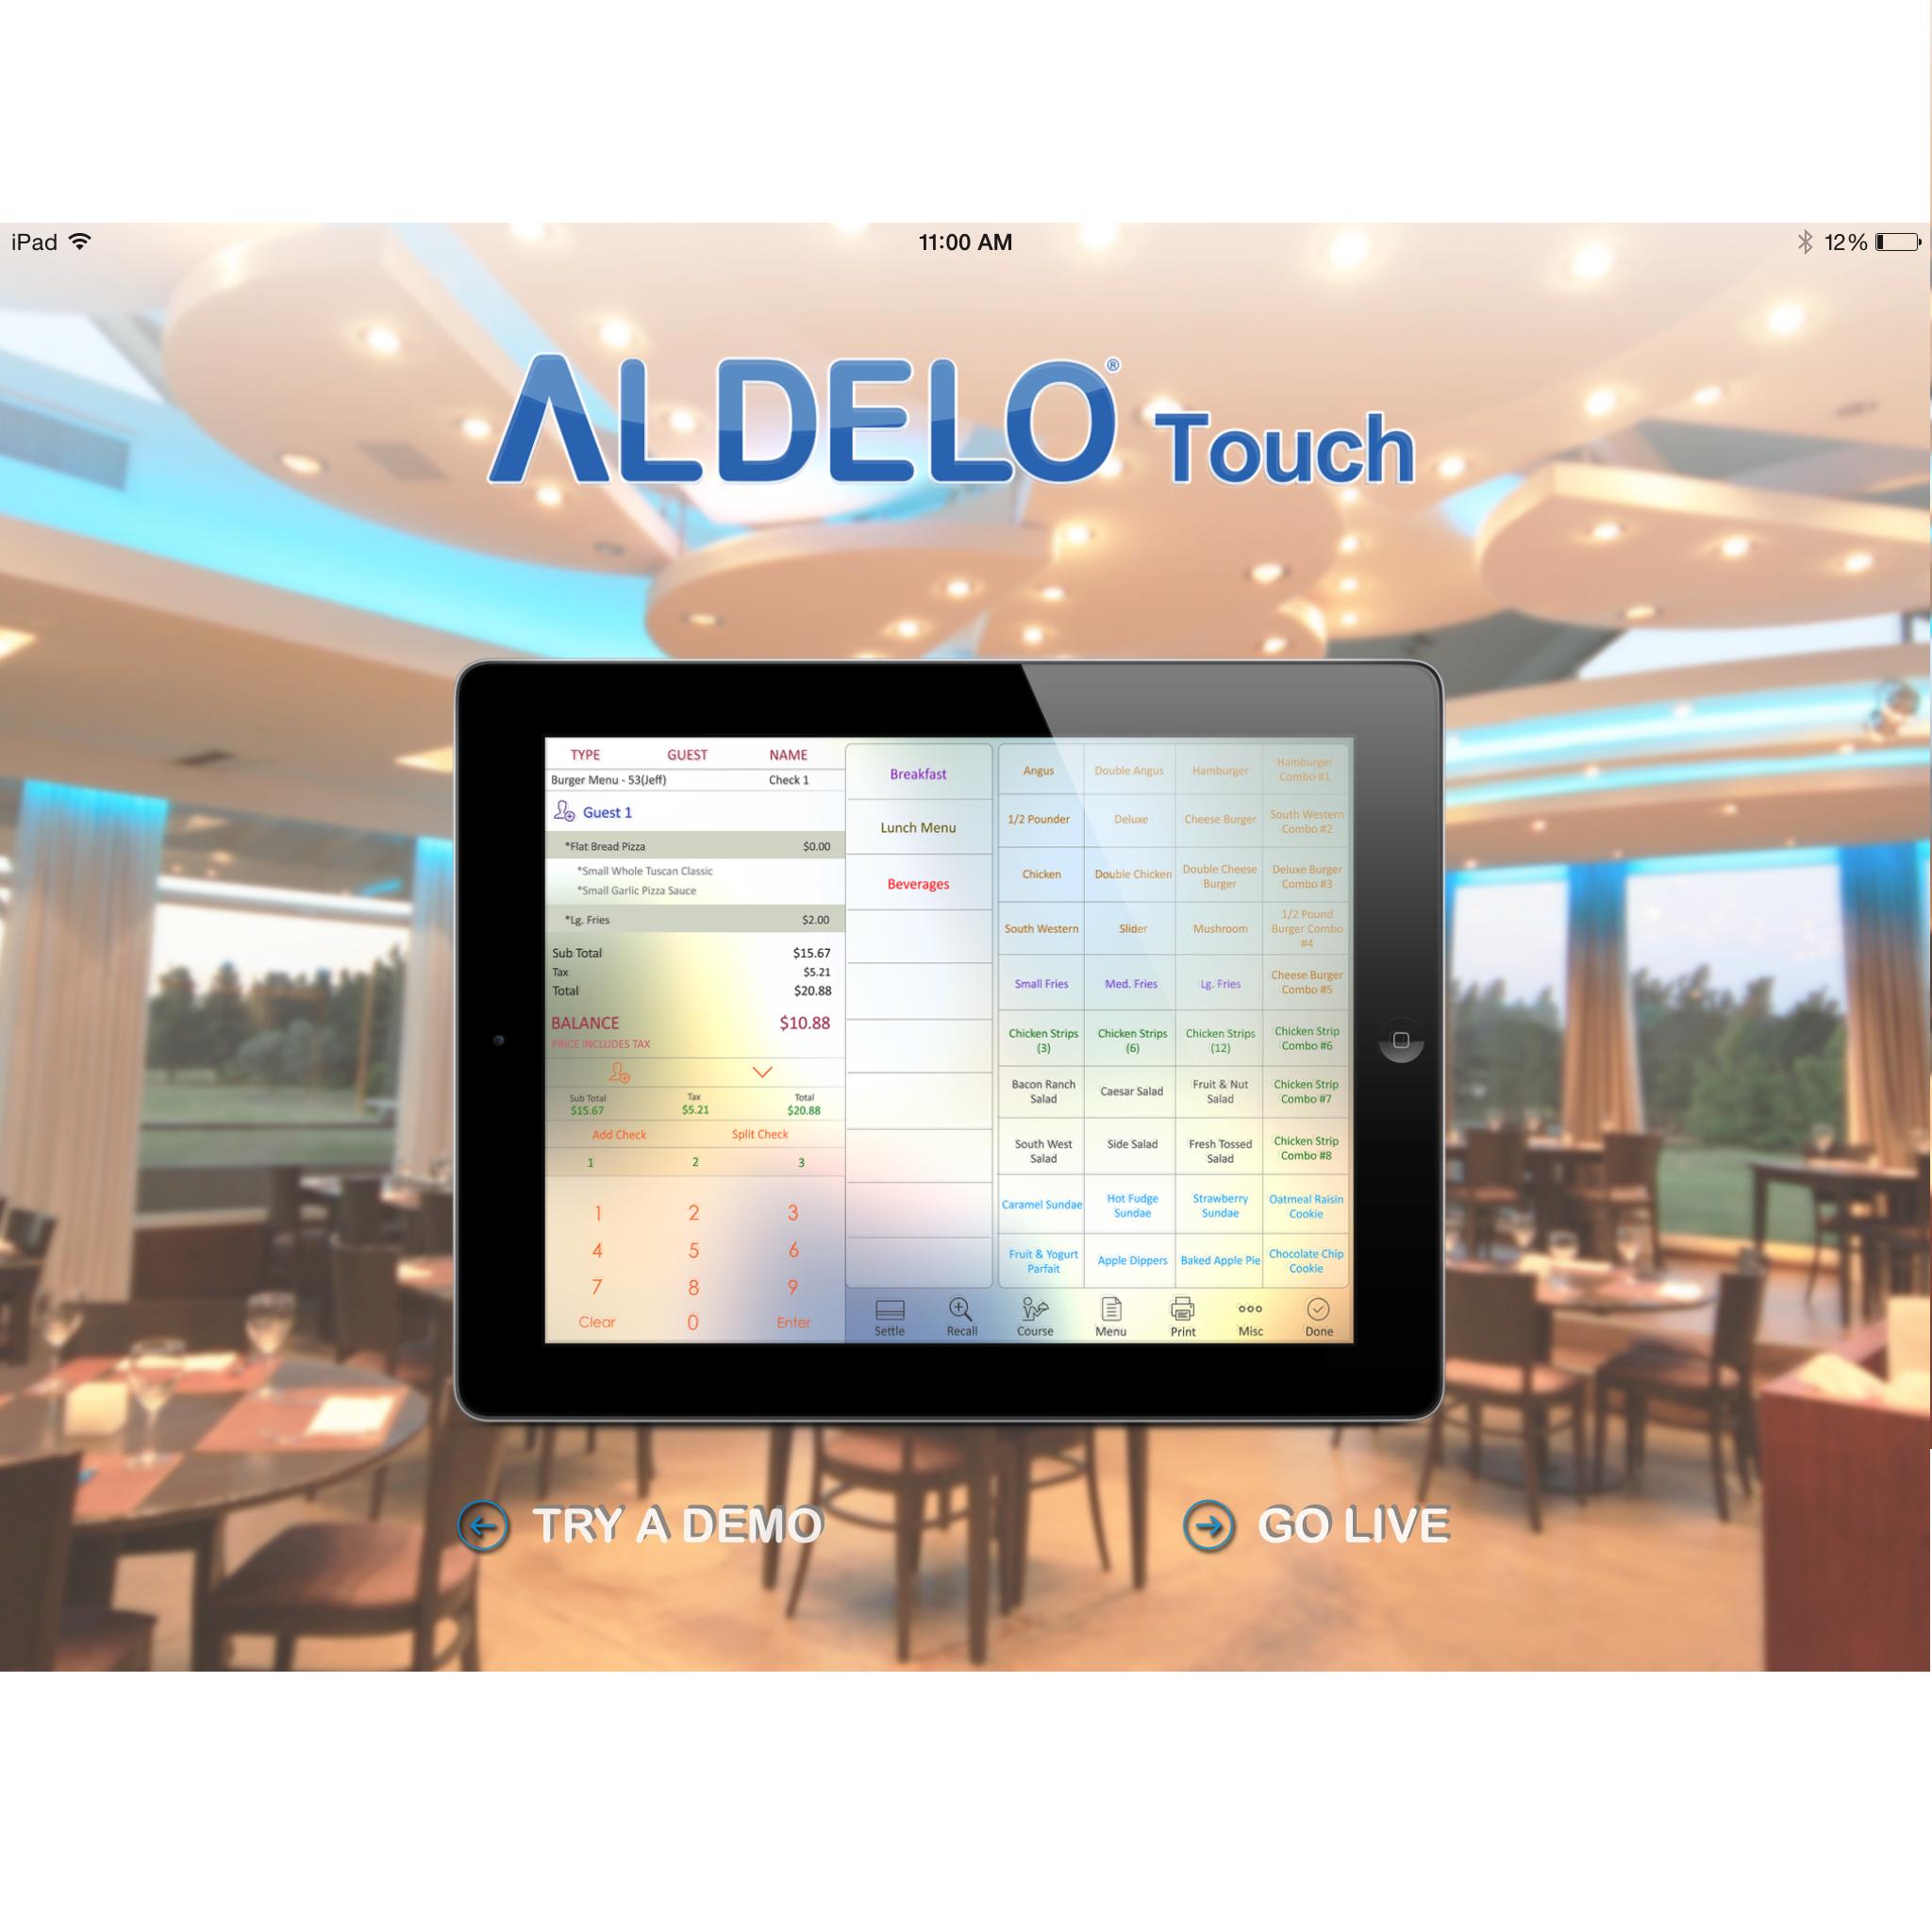 Aldelo Touch Image Thumbnail 2